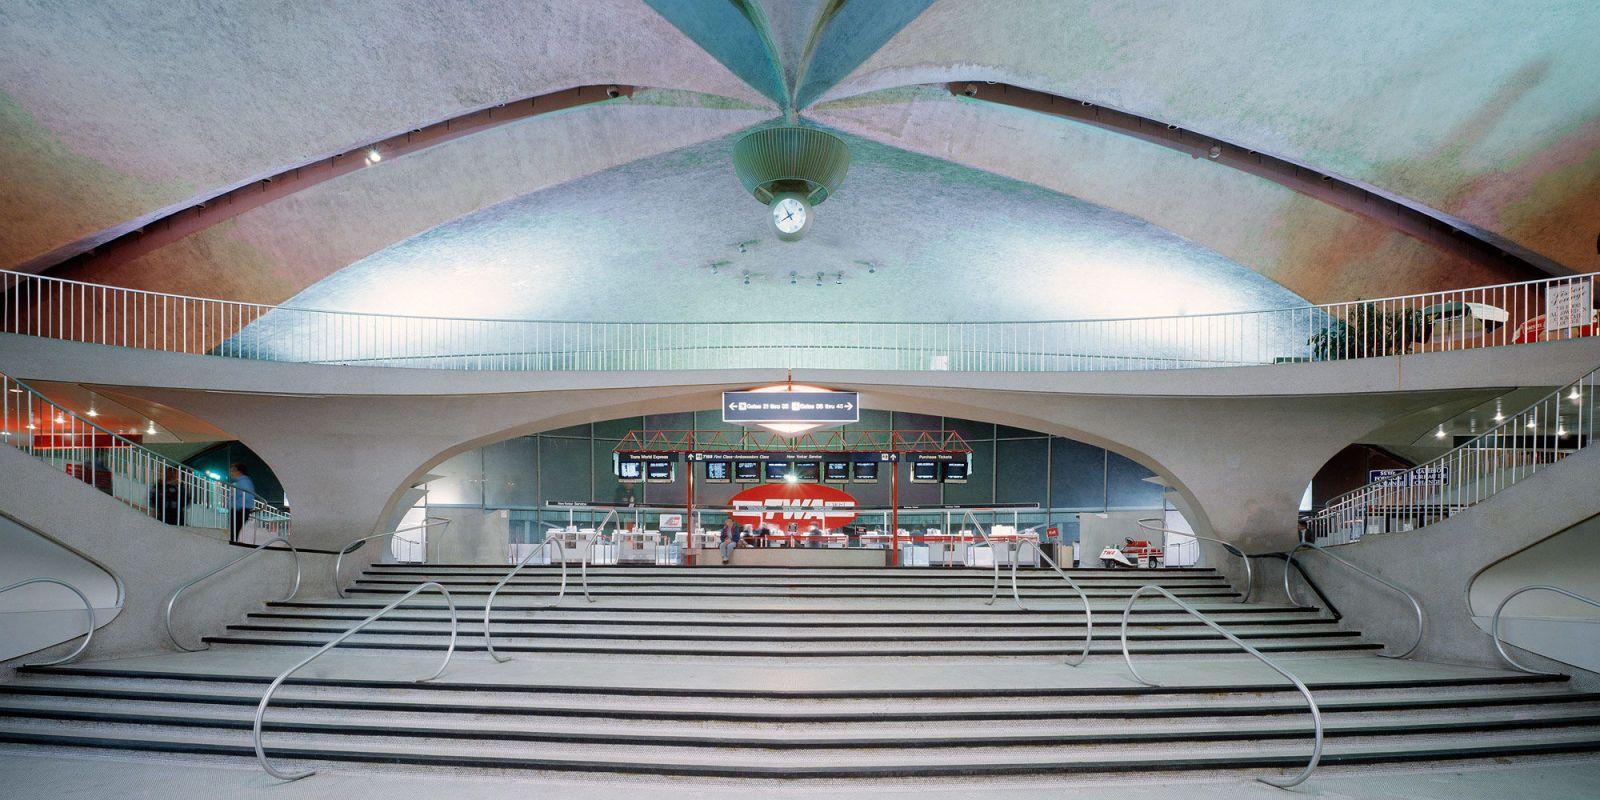 Eero Saarinen's Iconic TWA Terminal Is Getting A New Lease On Life